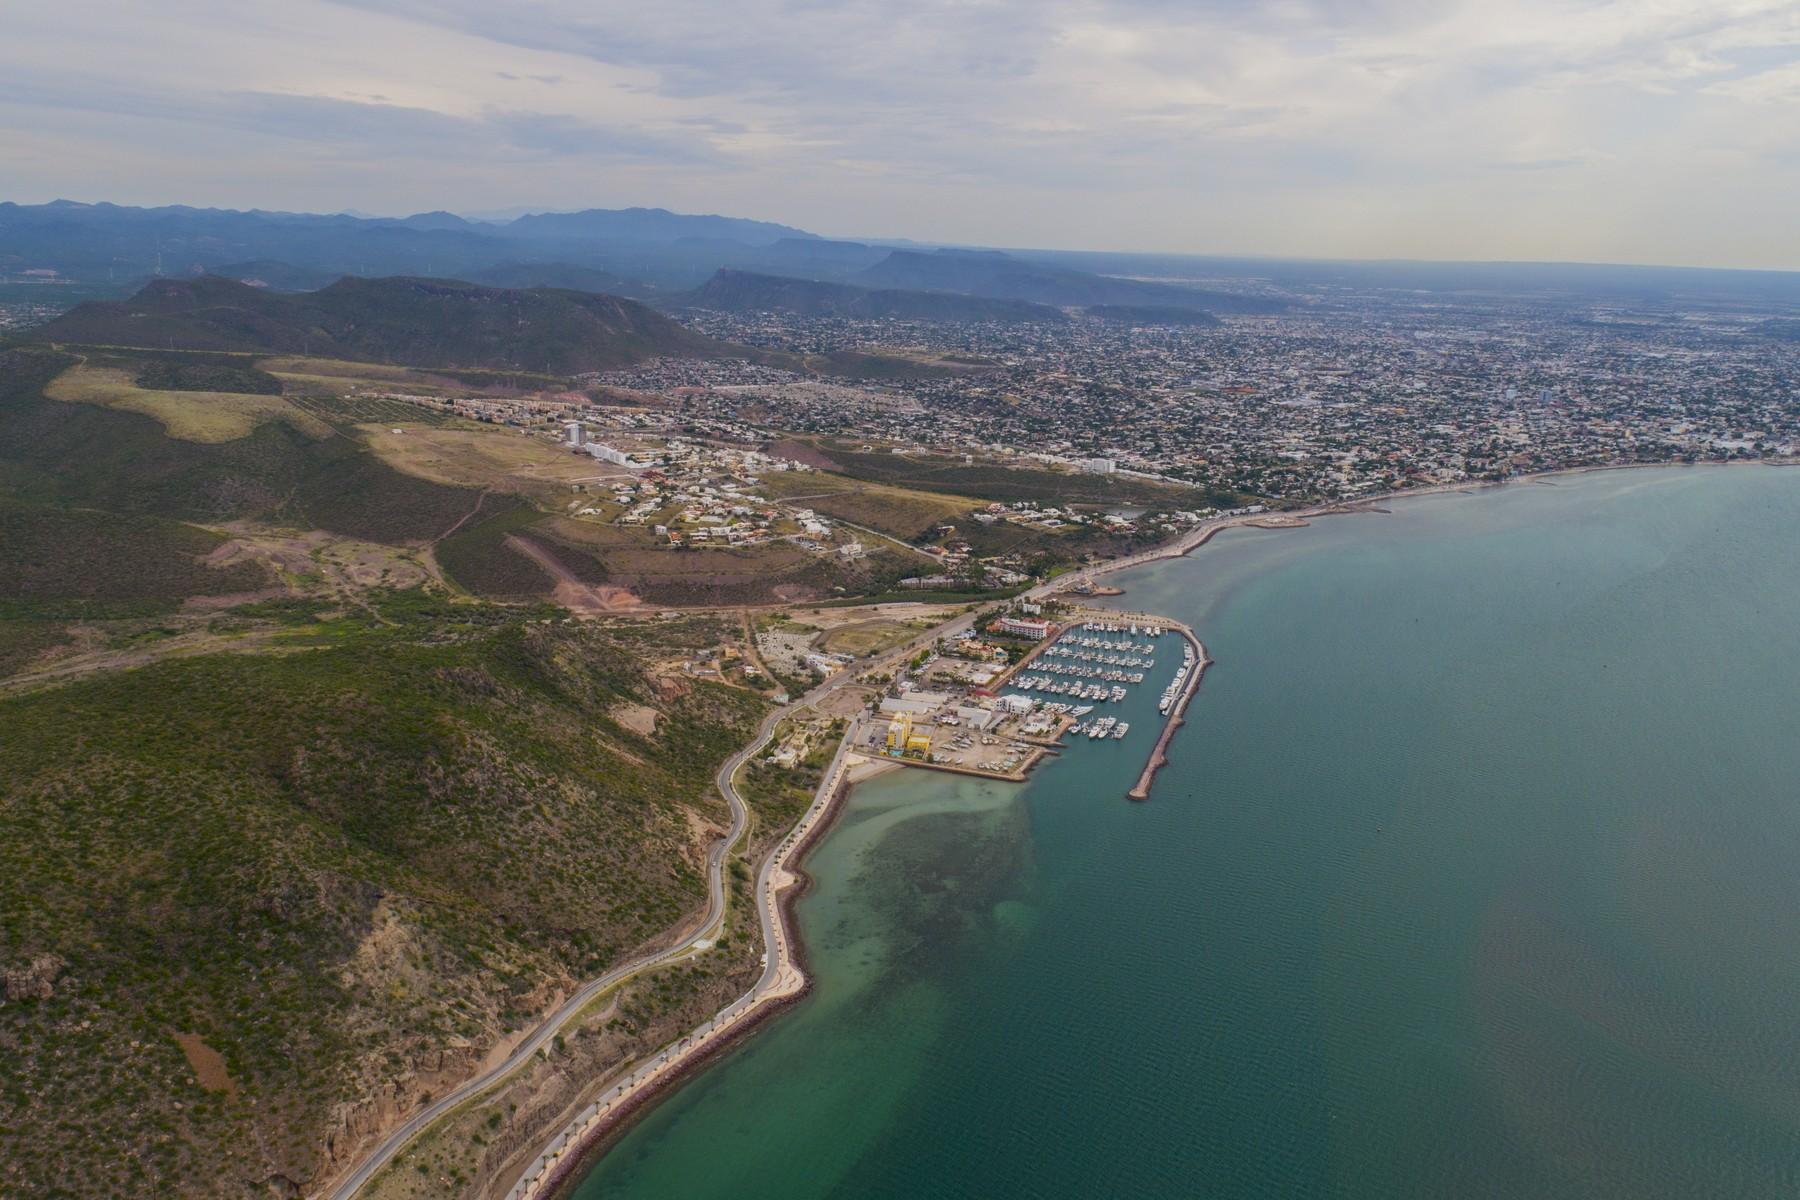 Land for Sale at Poligonal 6 Carretera a Pichilingue La Paz, Baja California Sur 23010 Mexico